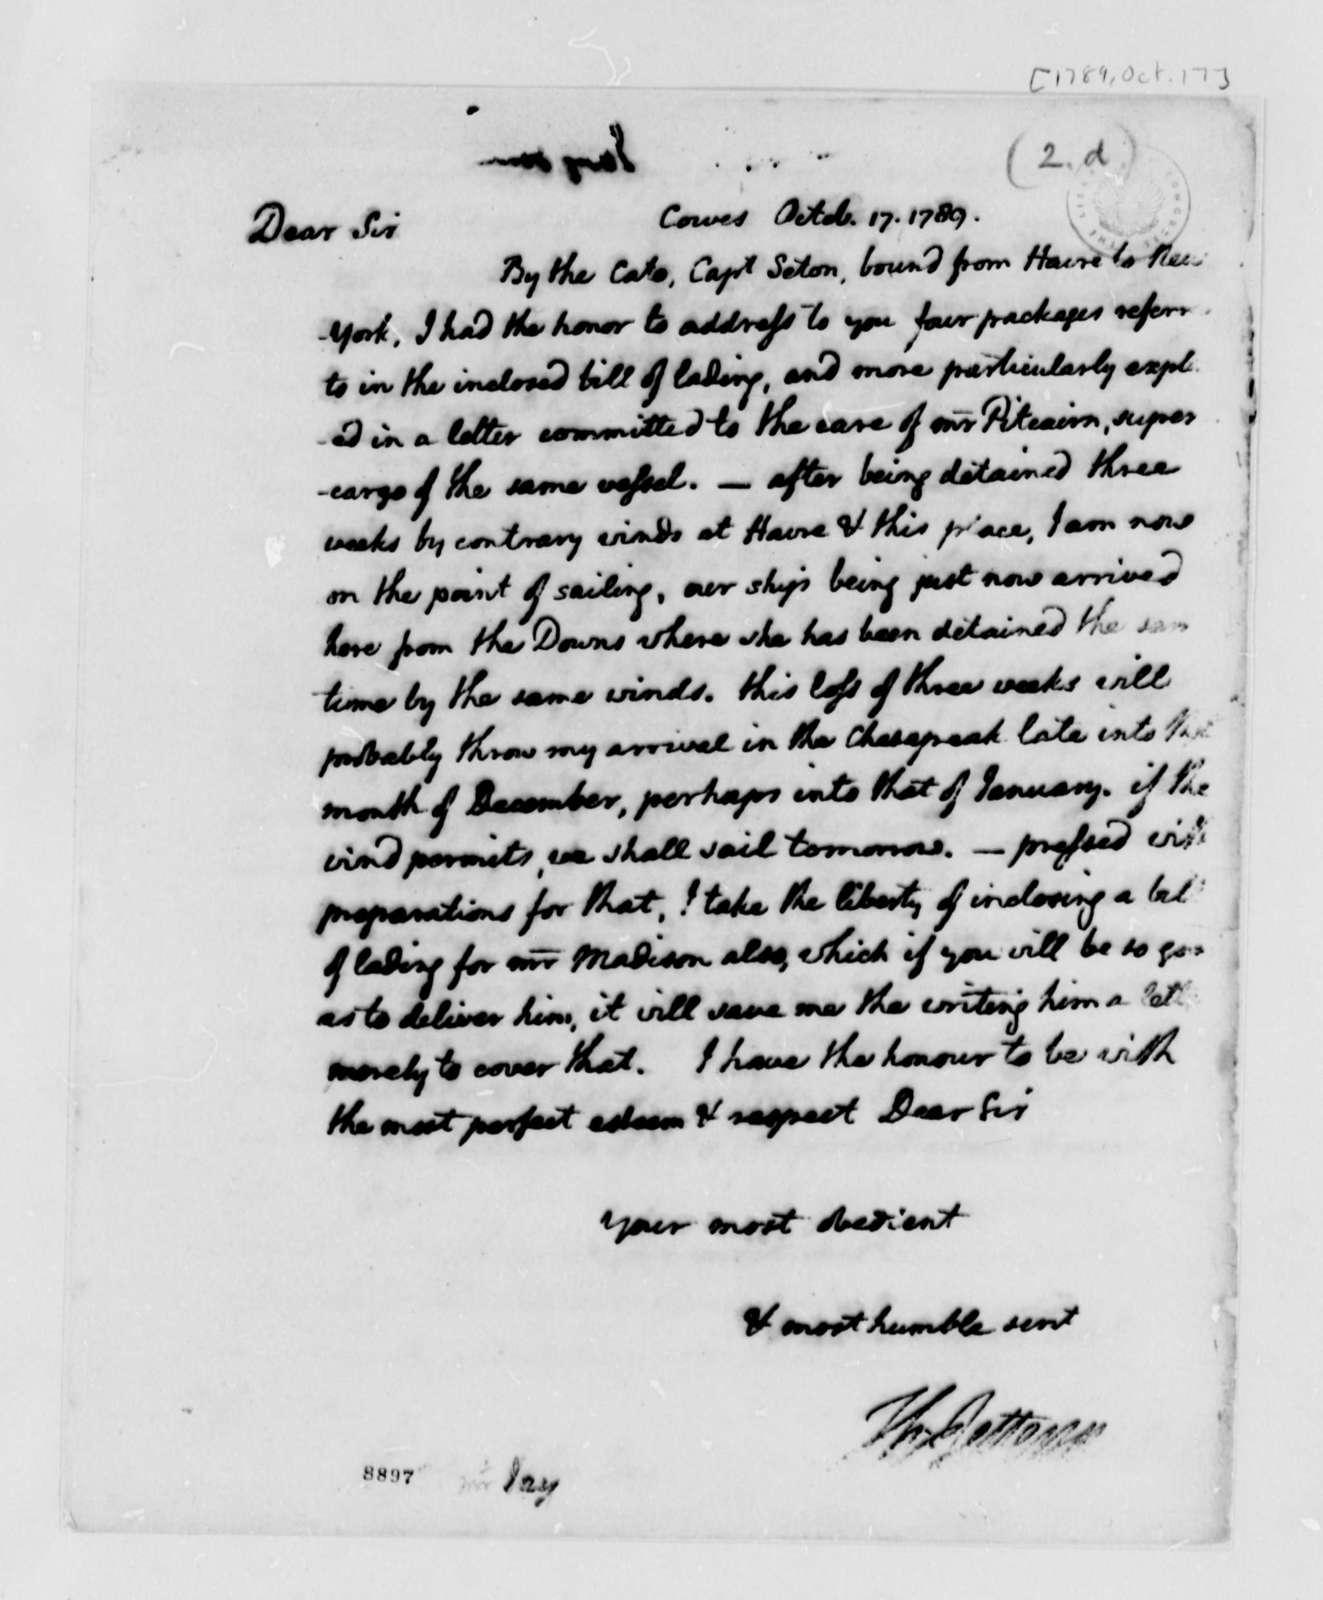 Thomas Jefferson to John Jay, October 17, 1789